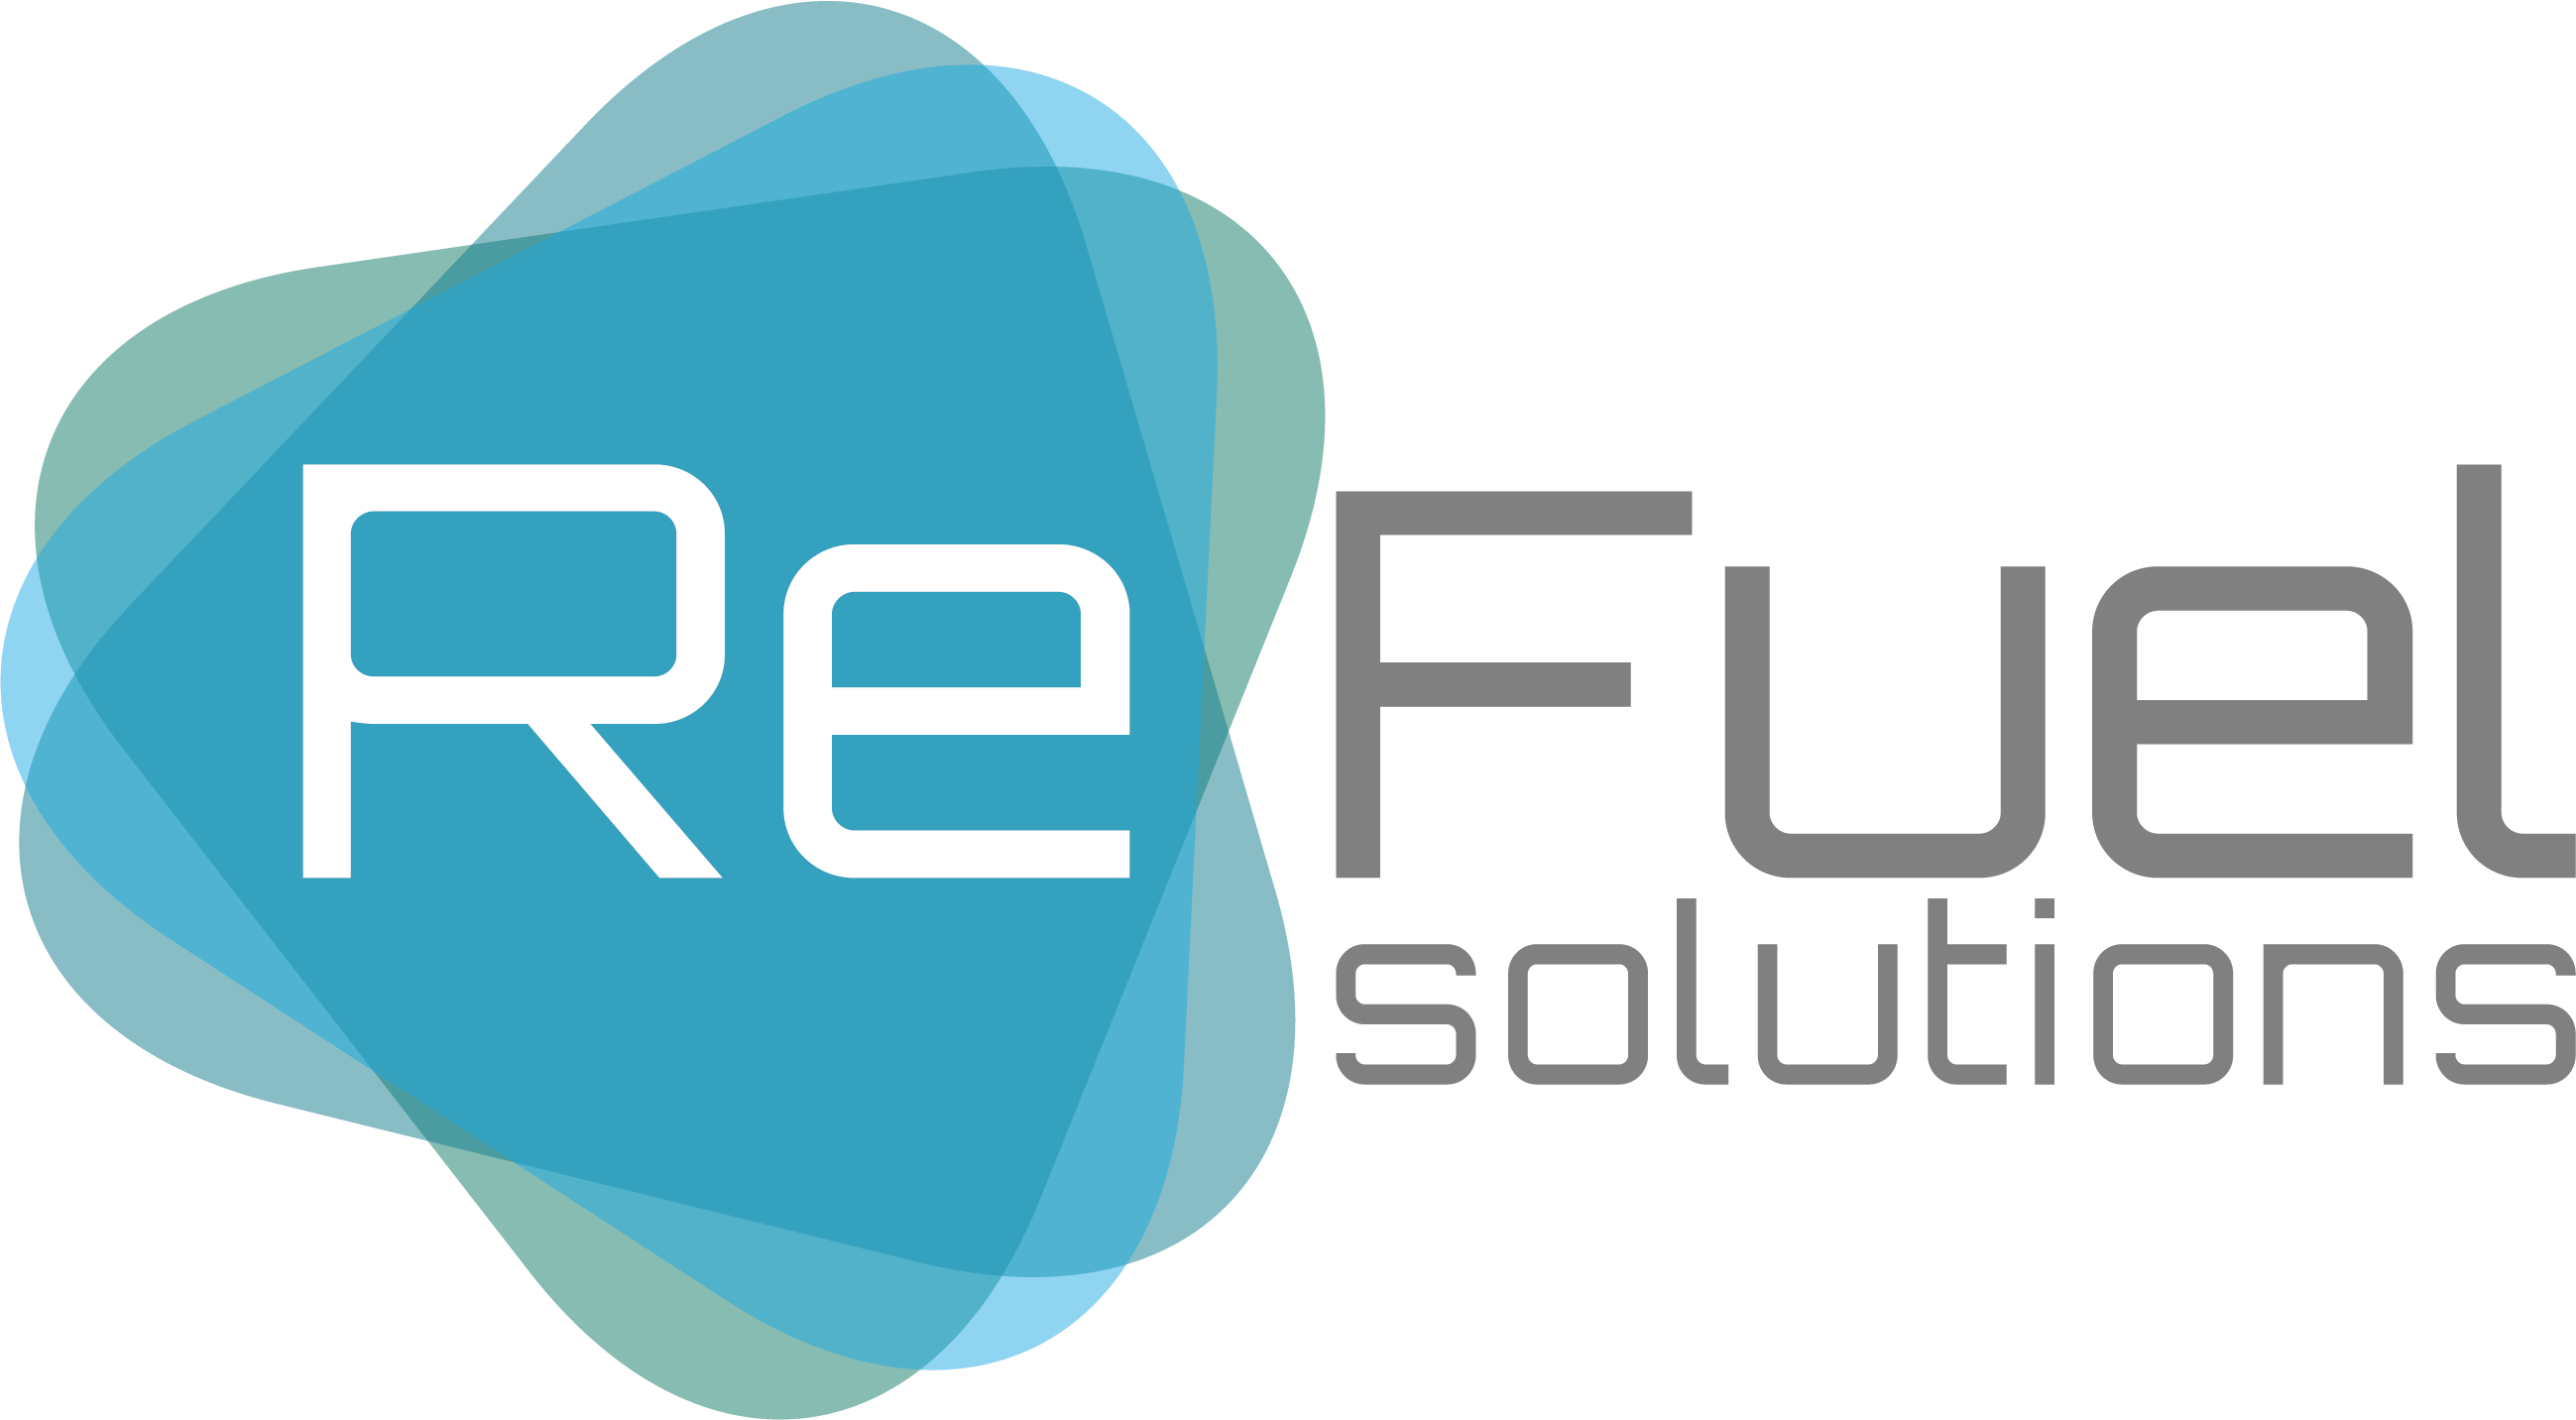 Refuel Solution